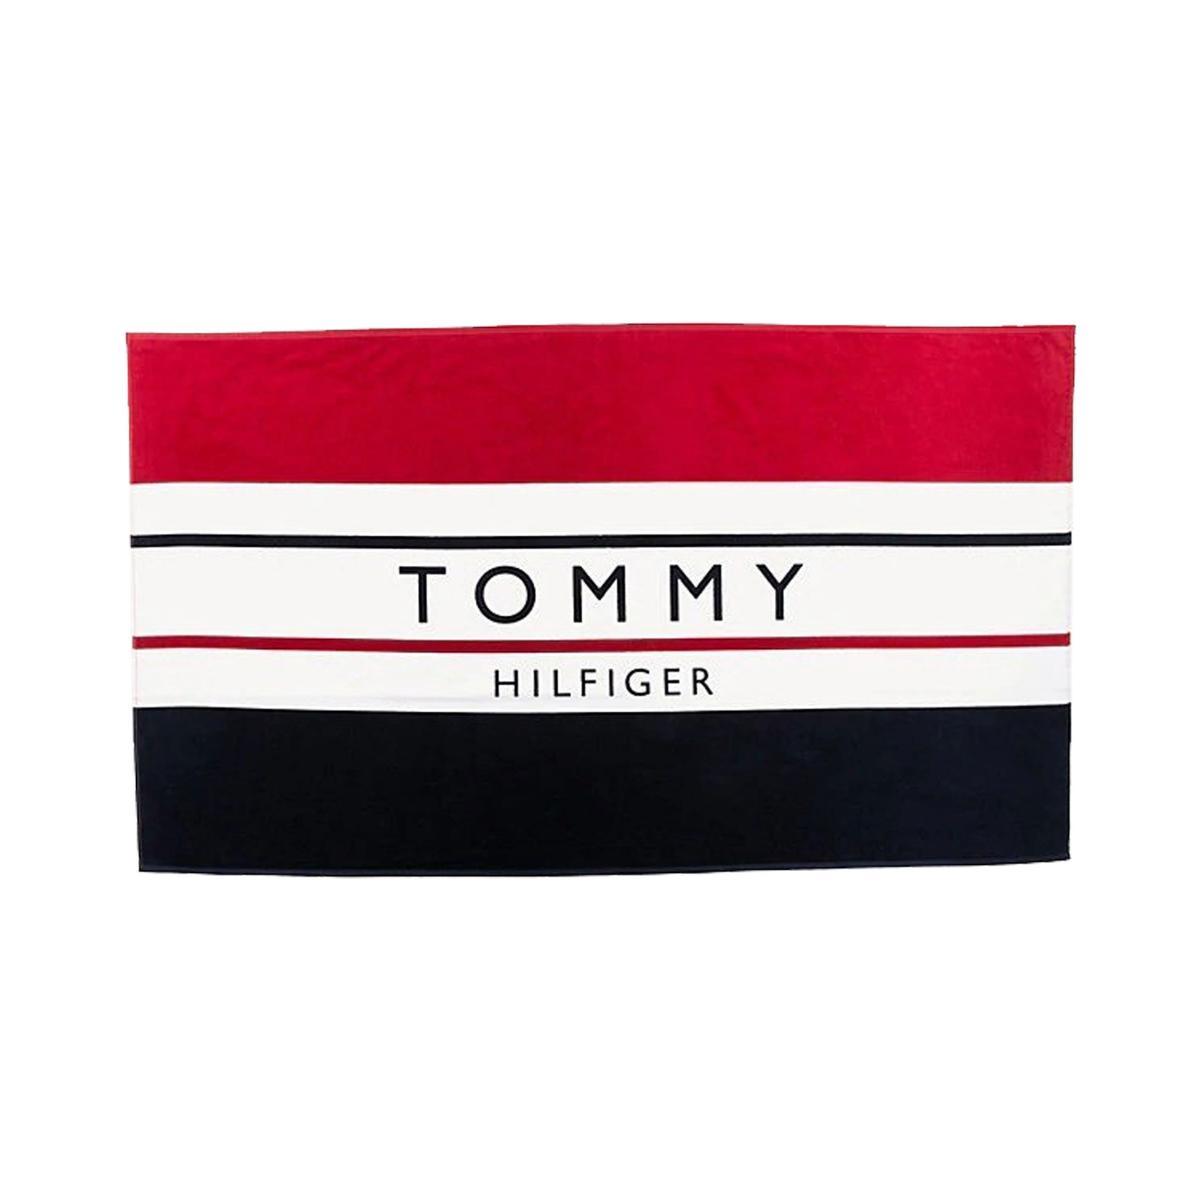 Telo mare Tommy Hilfiger in puro cotone con logo unisex rif. UU0UU00022